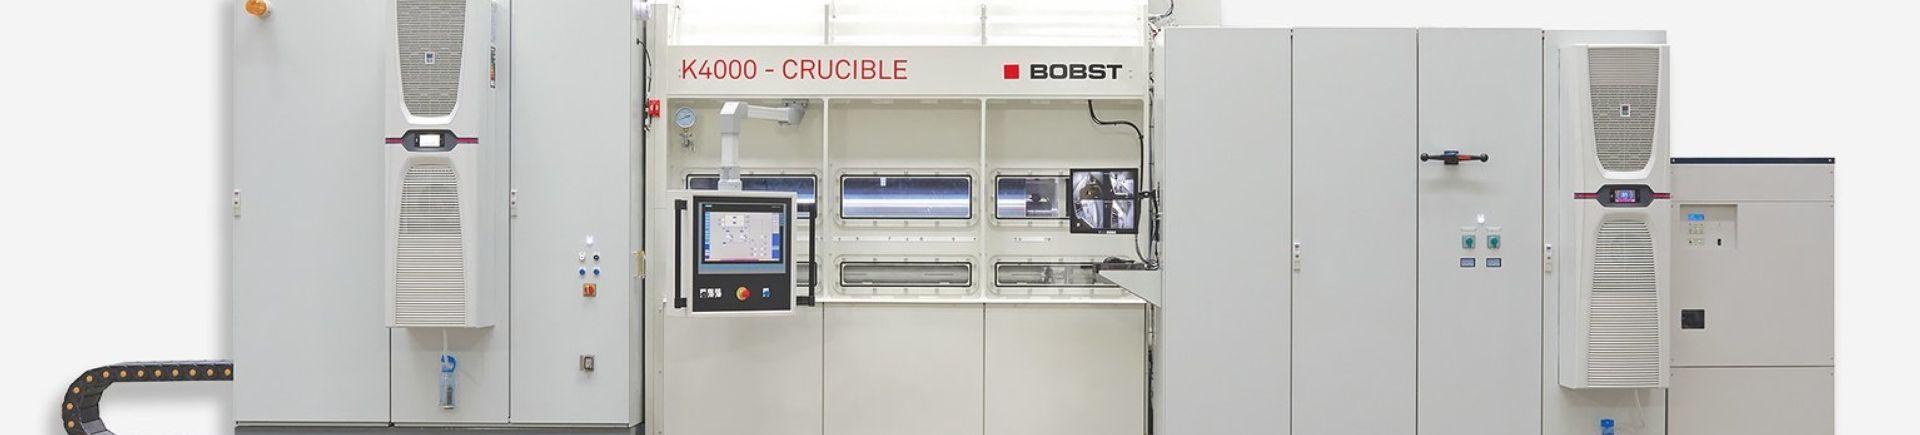 BOBST K4000 CRUCIBLE